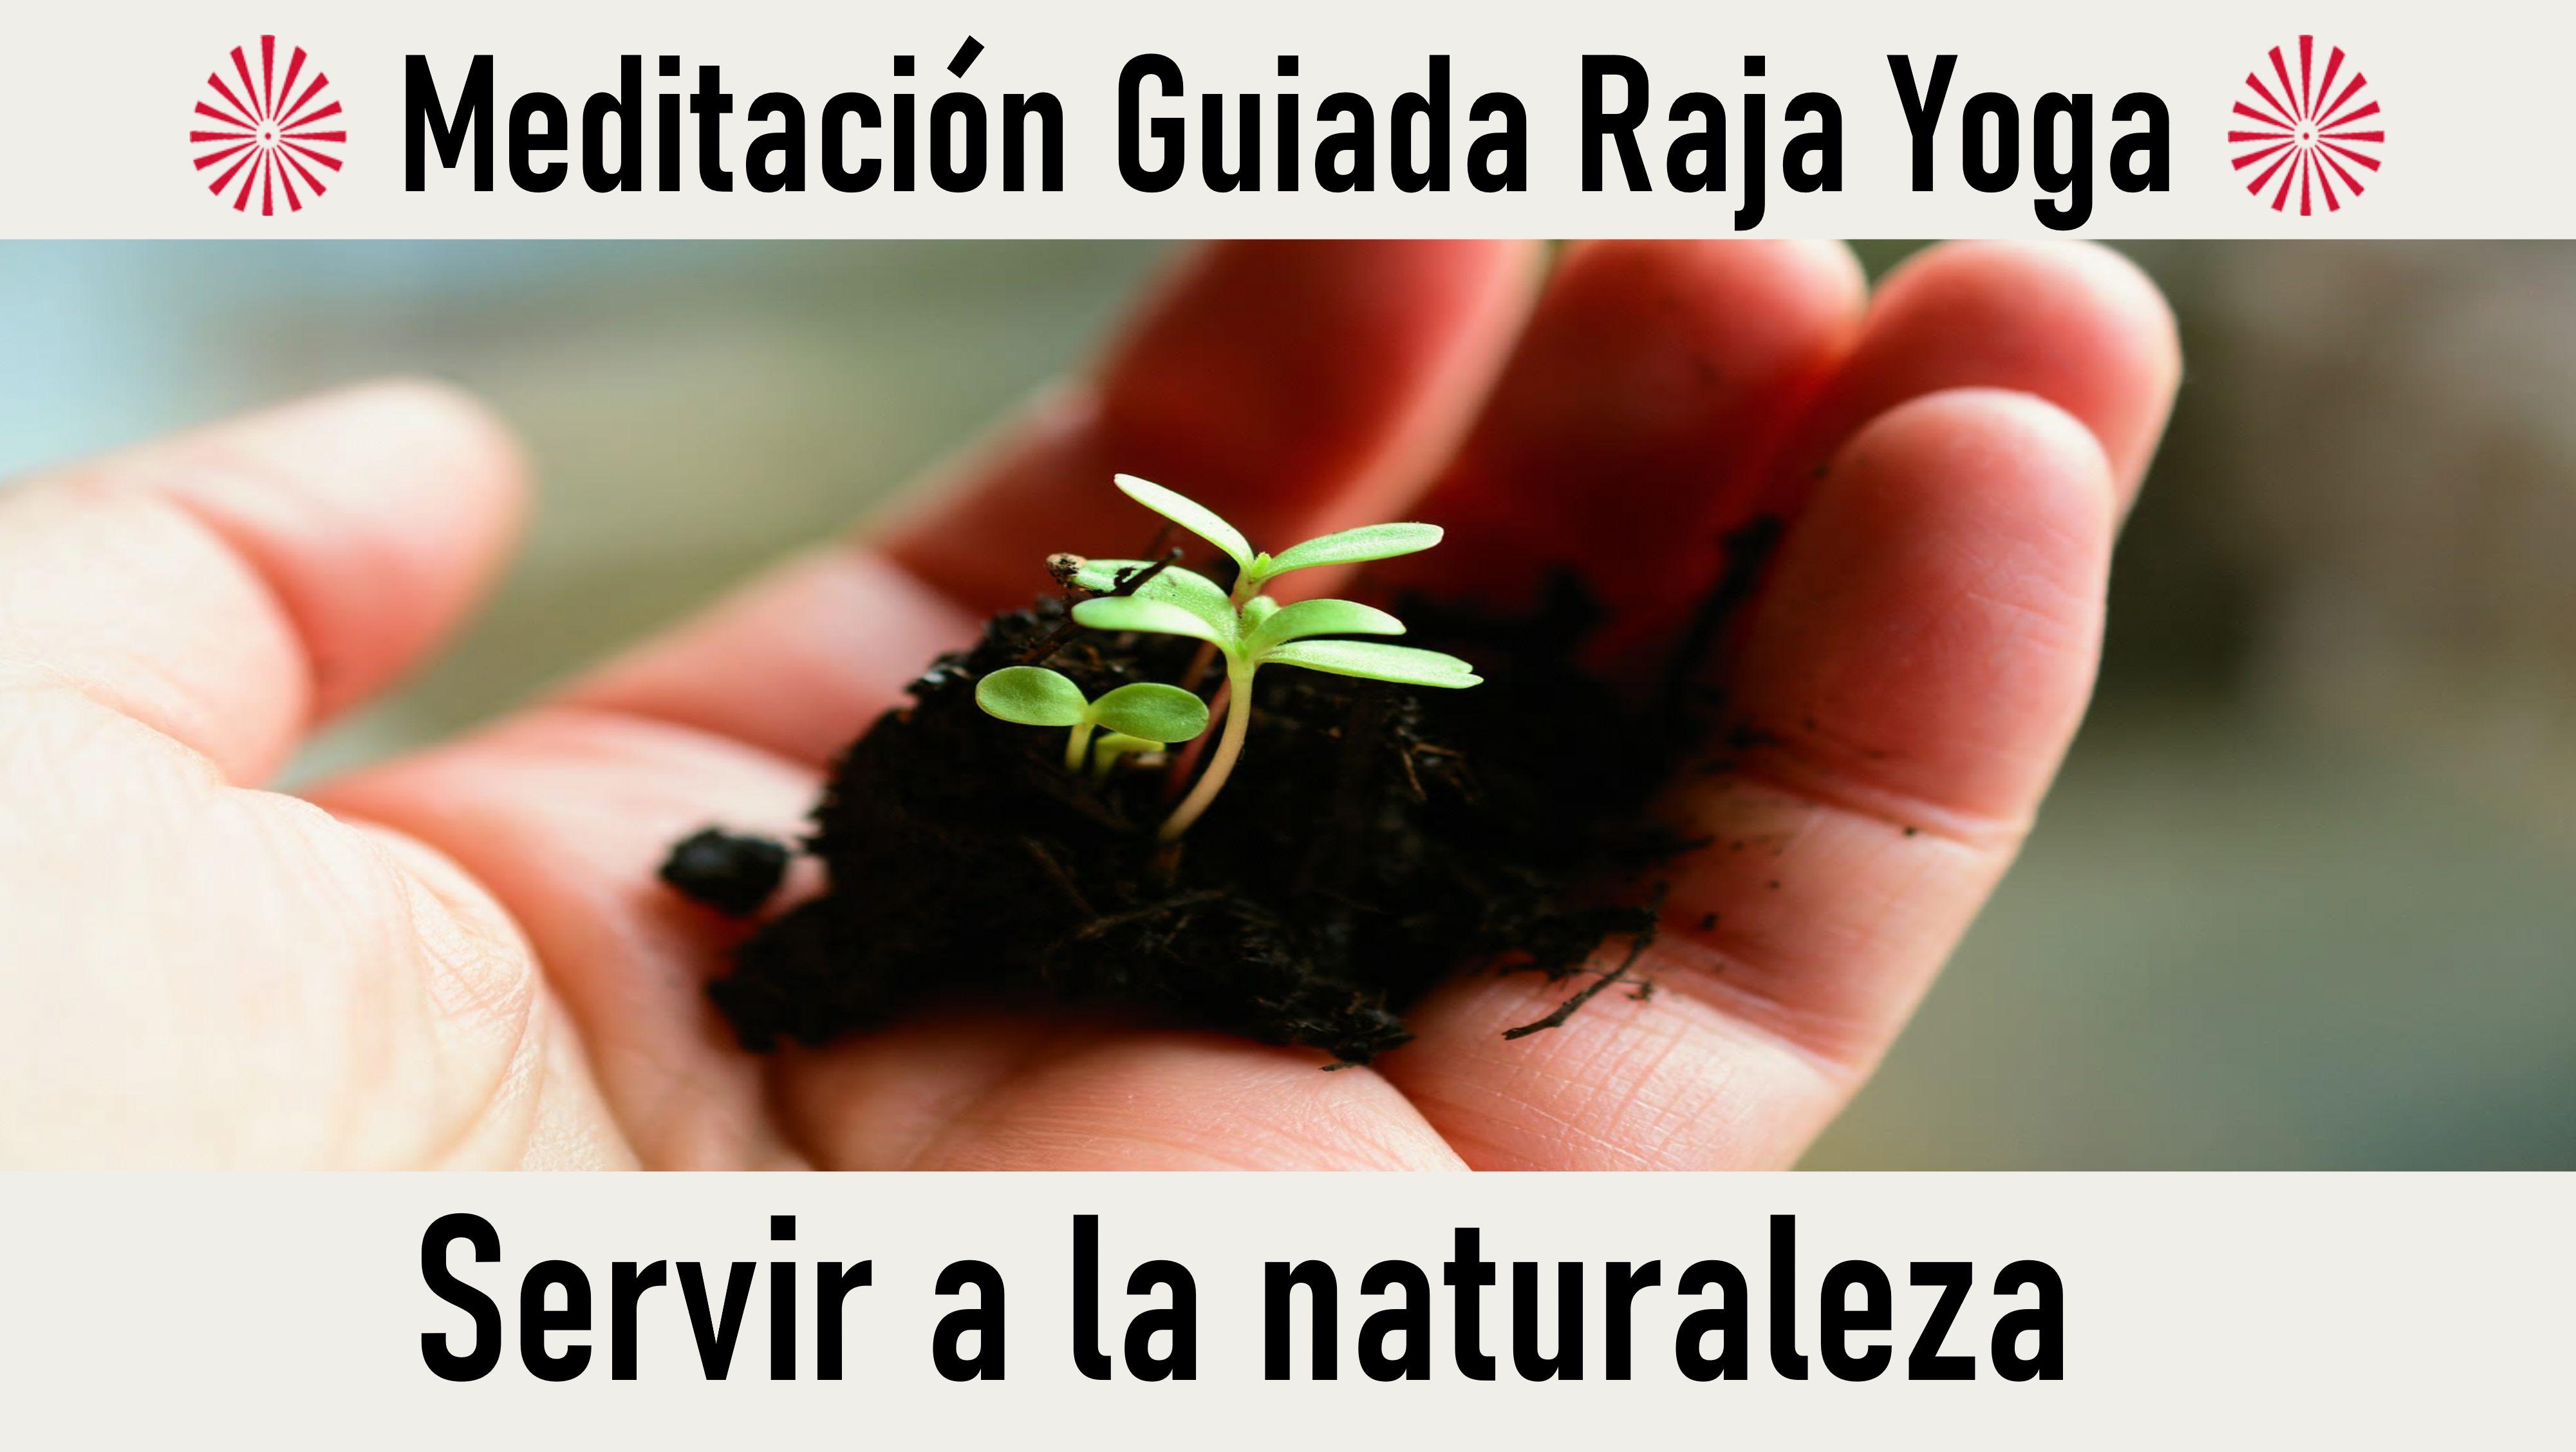 22 Octubre 2020  Meditación guiada: Servir a la naturaleza